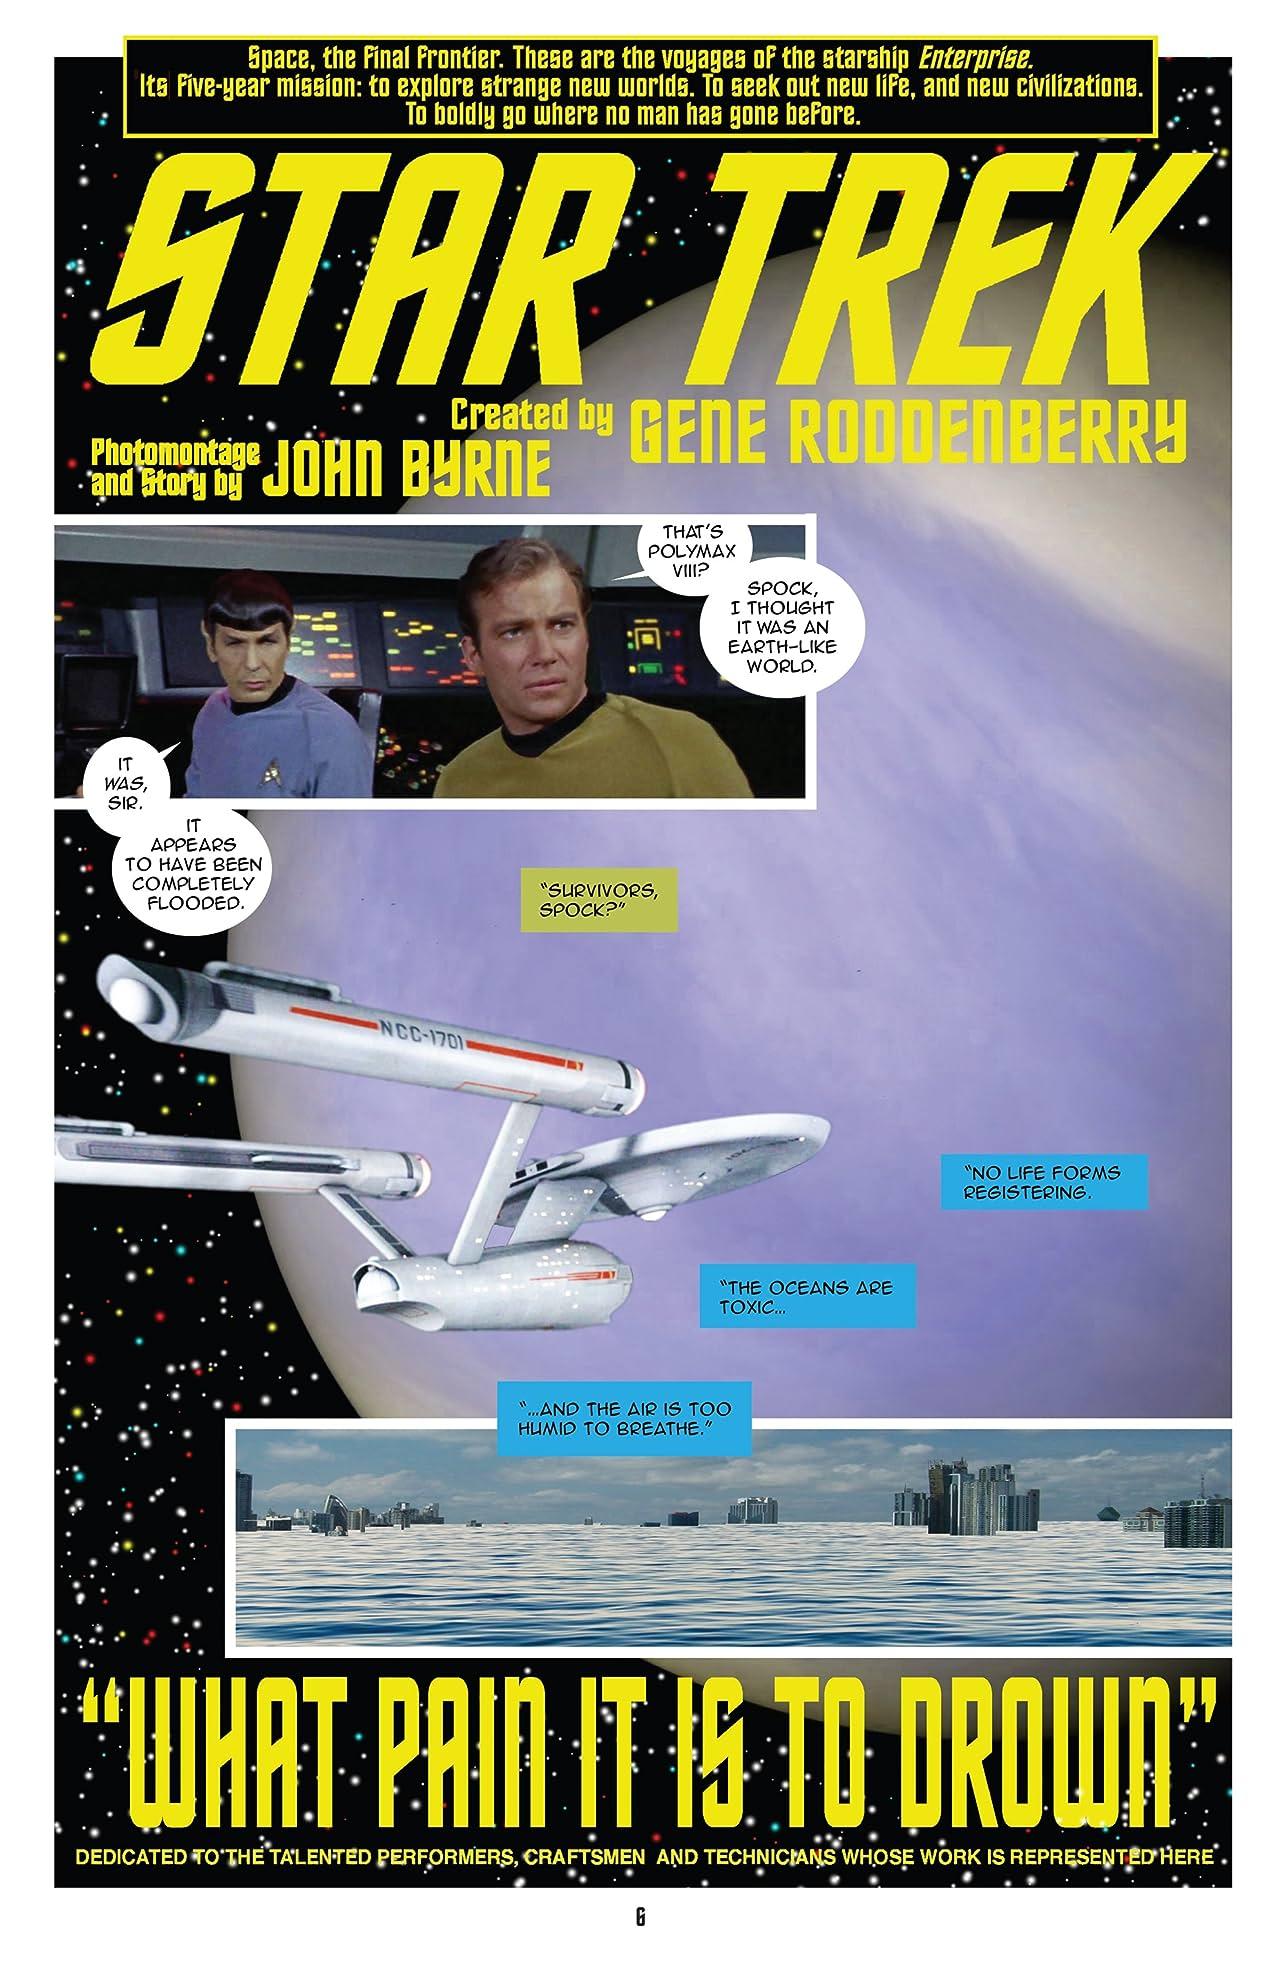 Star Trek: New Visions Vol. 7